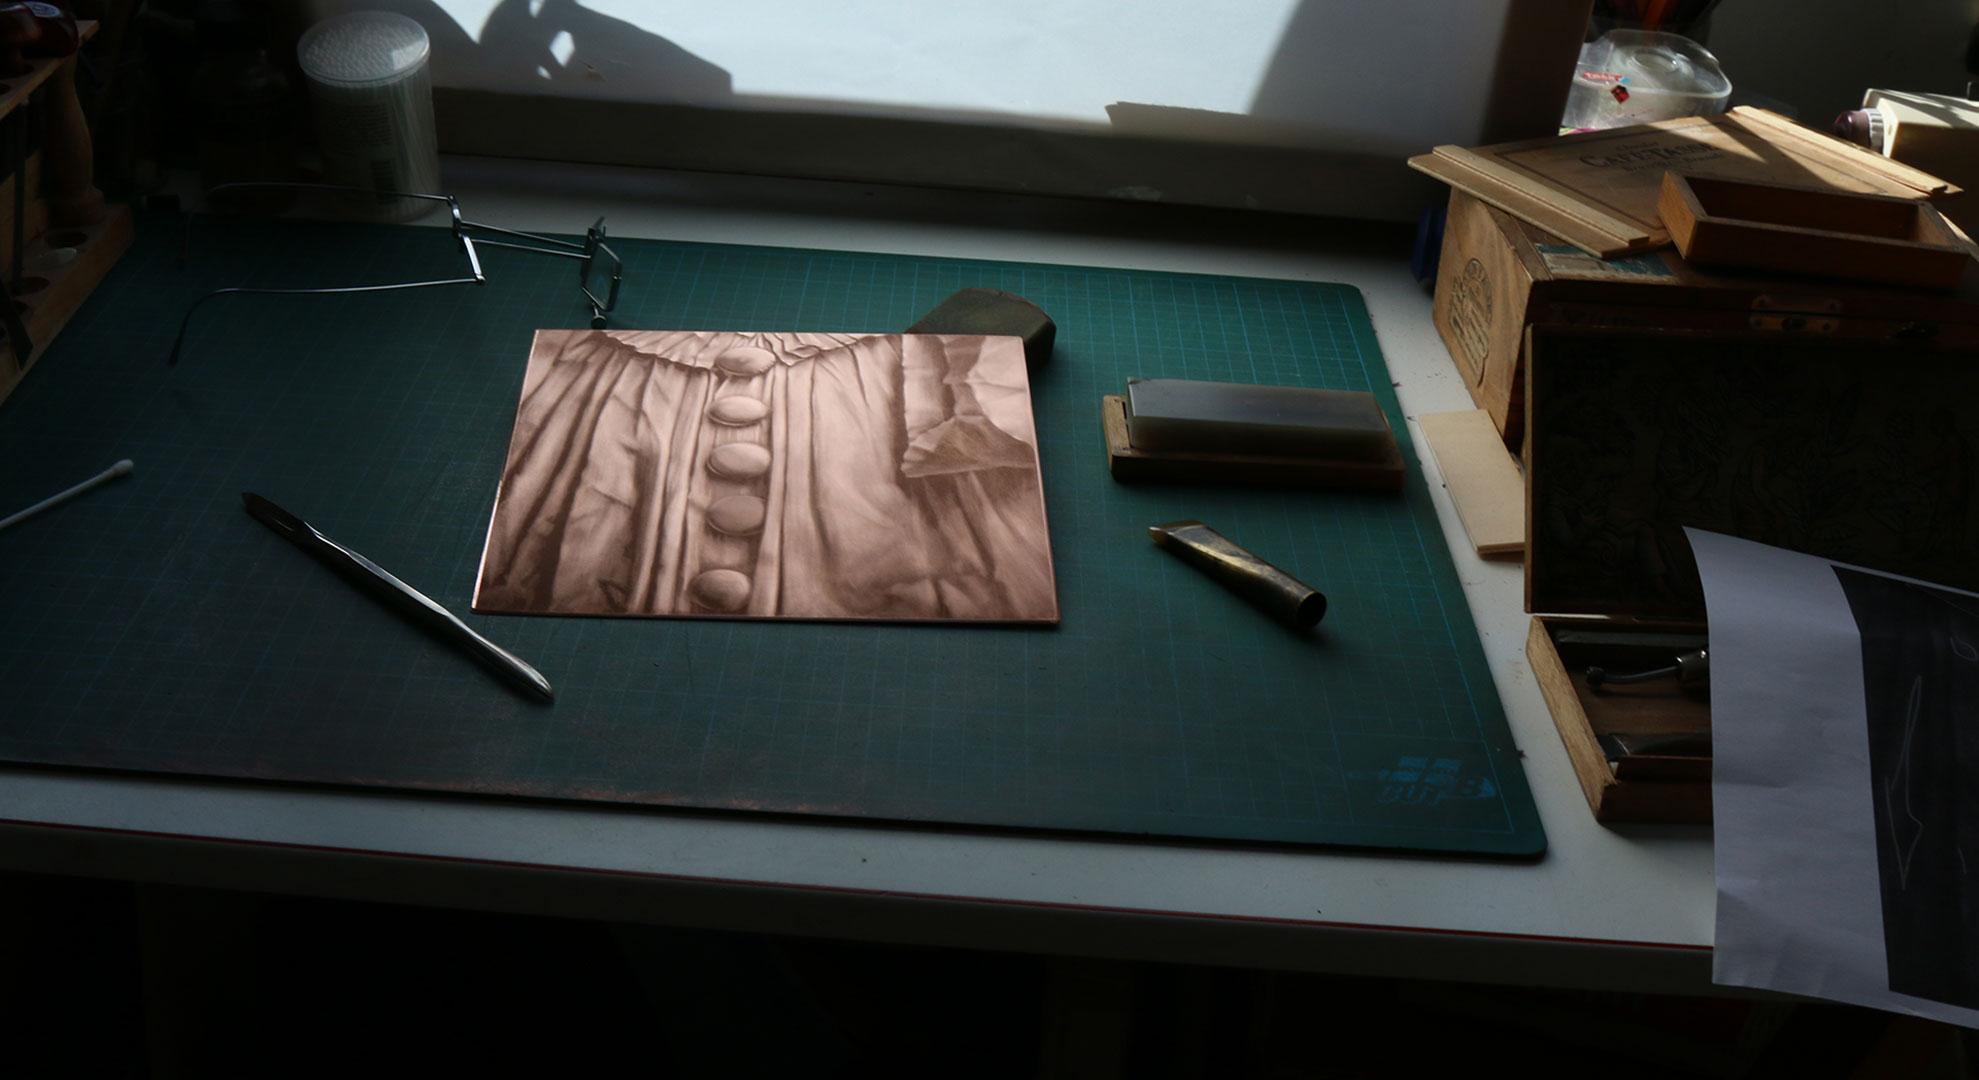 Table gravure